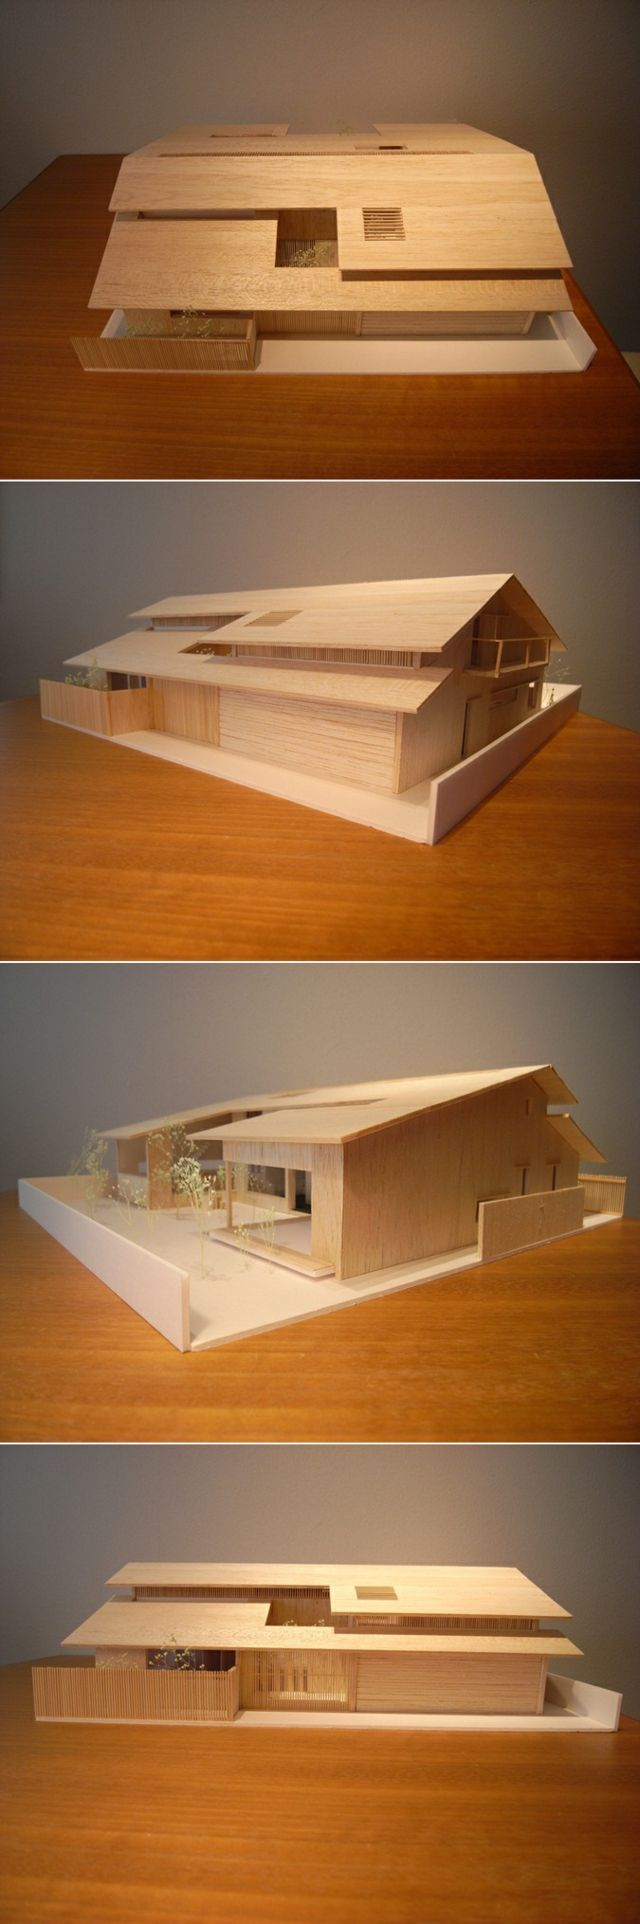 Haus Bauprojekt 3d Moderne Architektur Plan Architecture